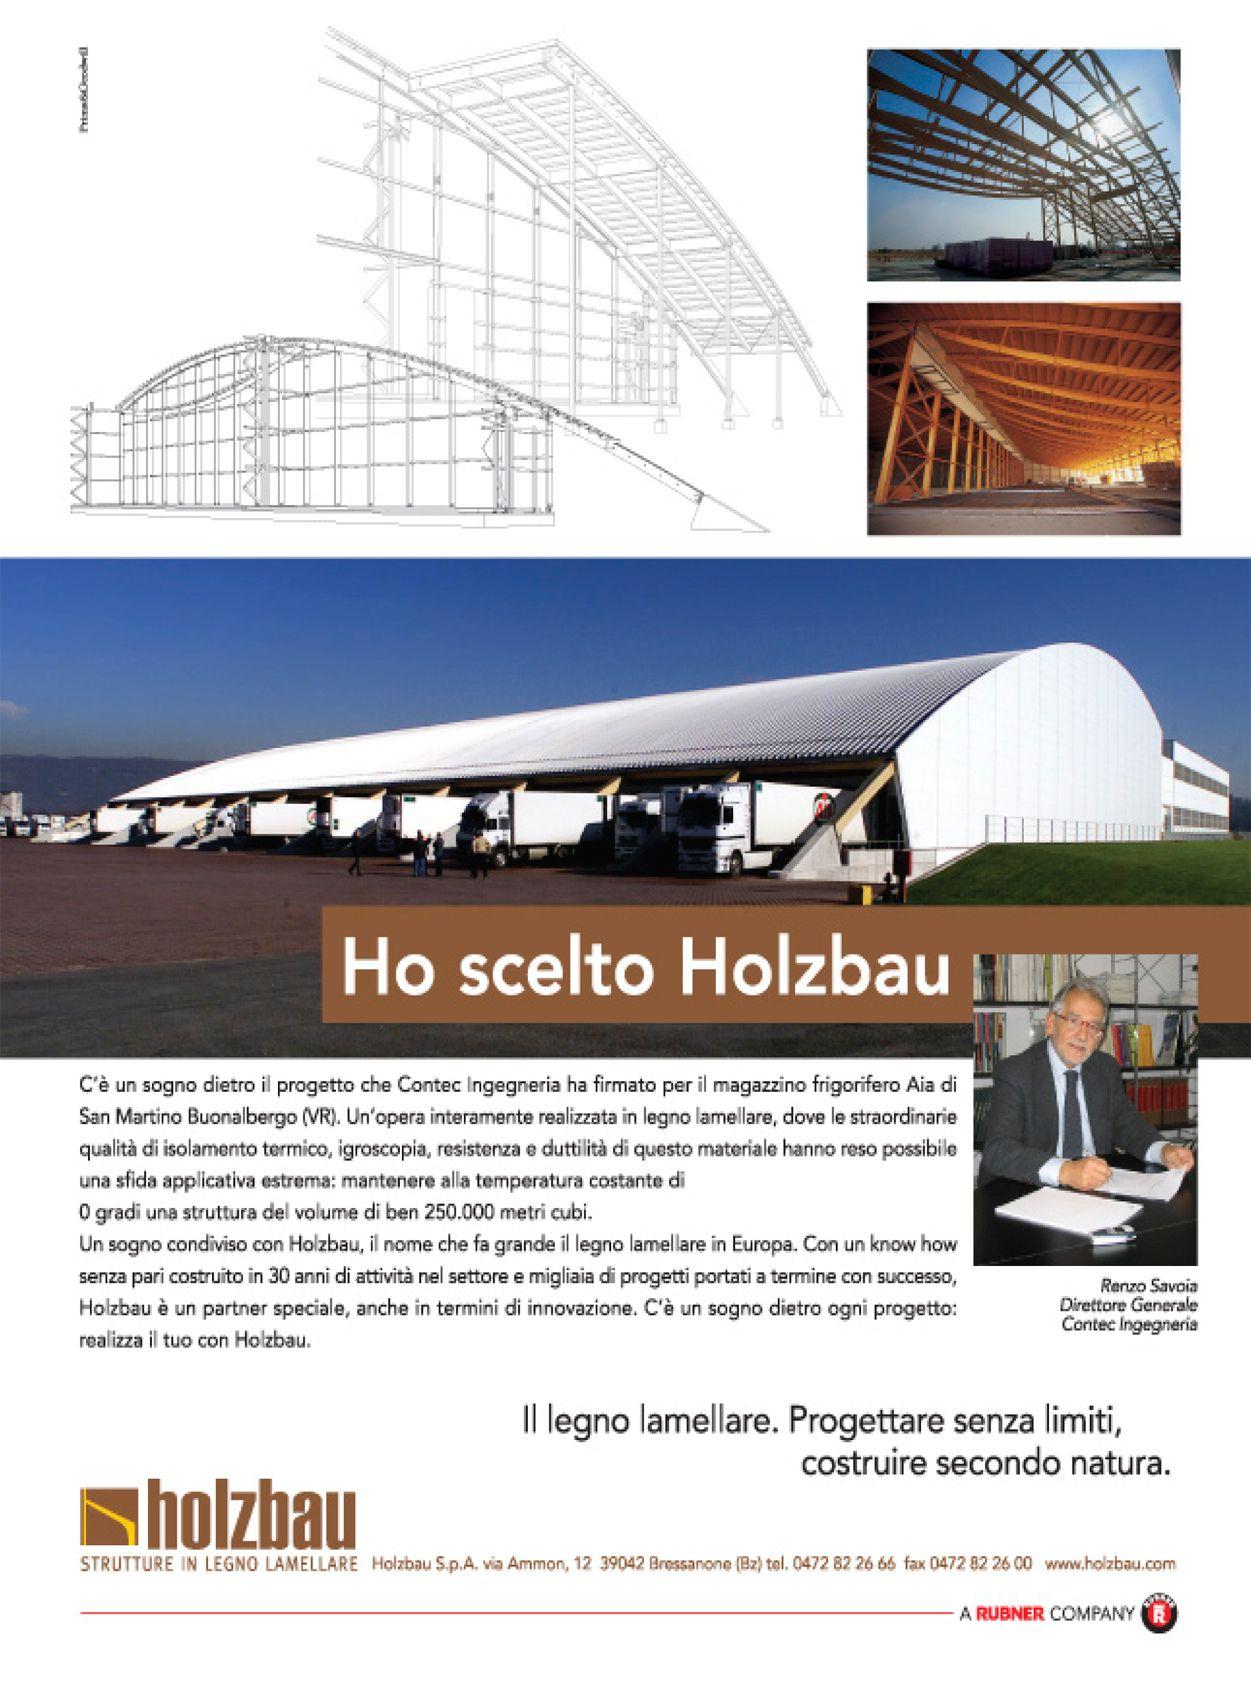 Advertising Holzbau